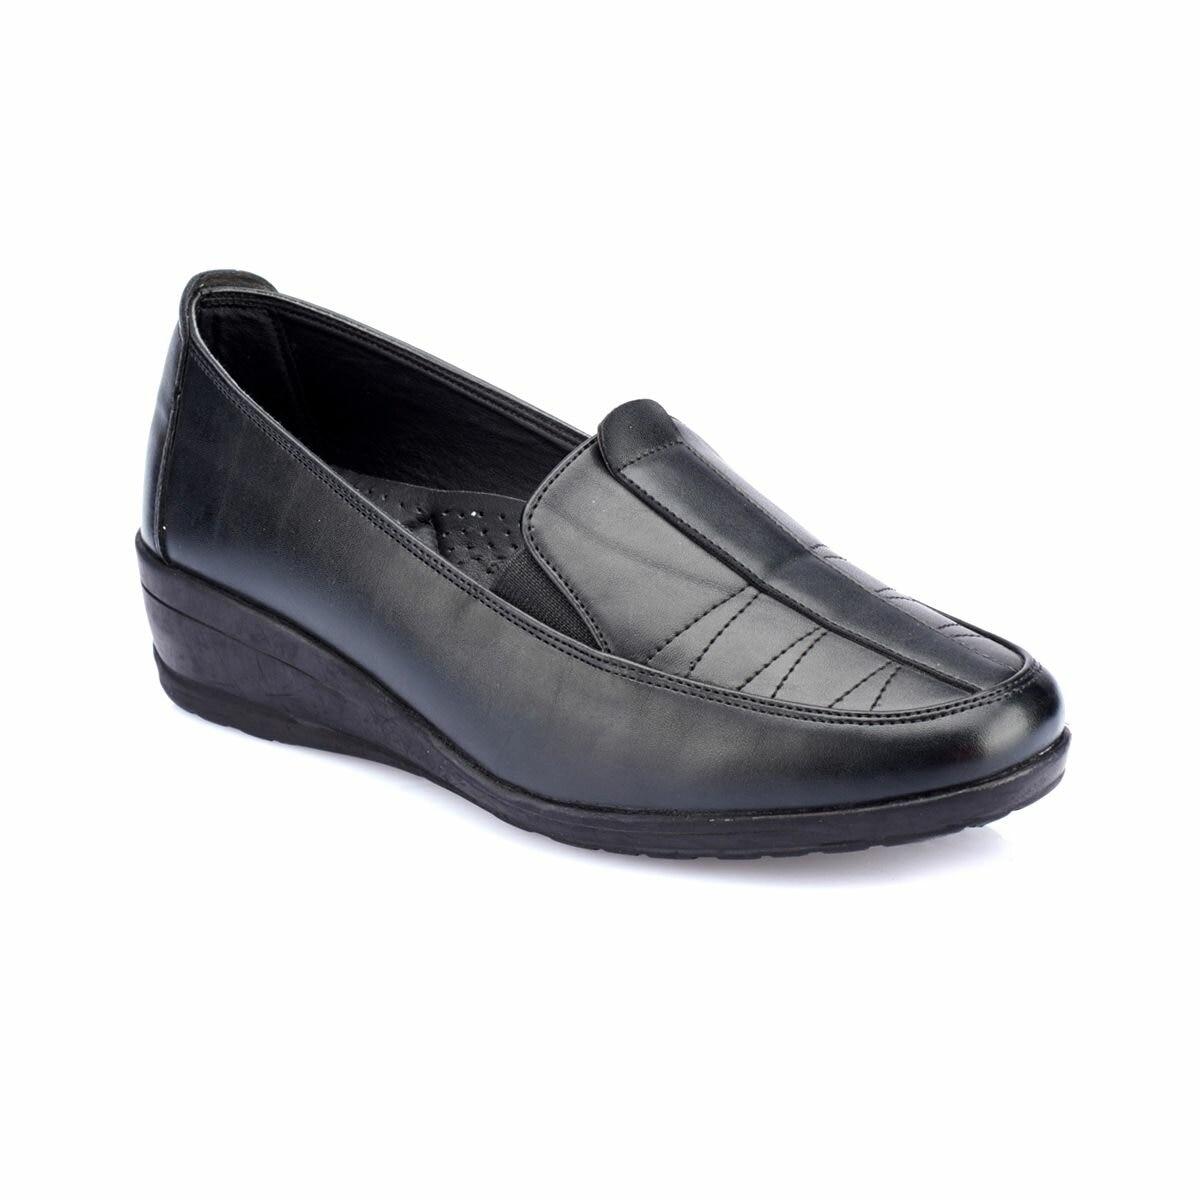 FLO 82.150060.Z Black Women Shoes Polaris